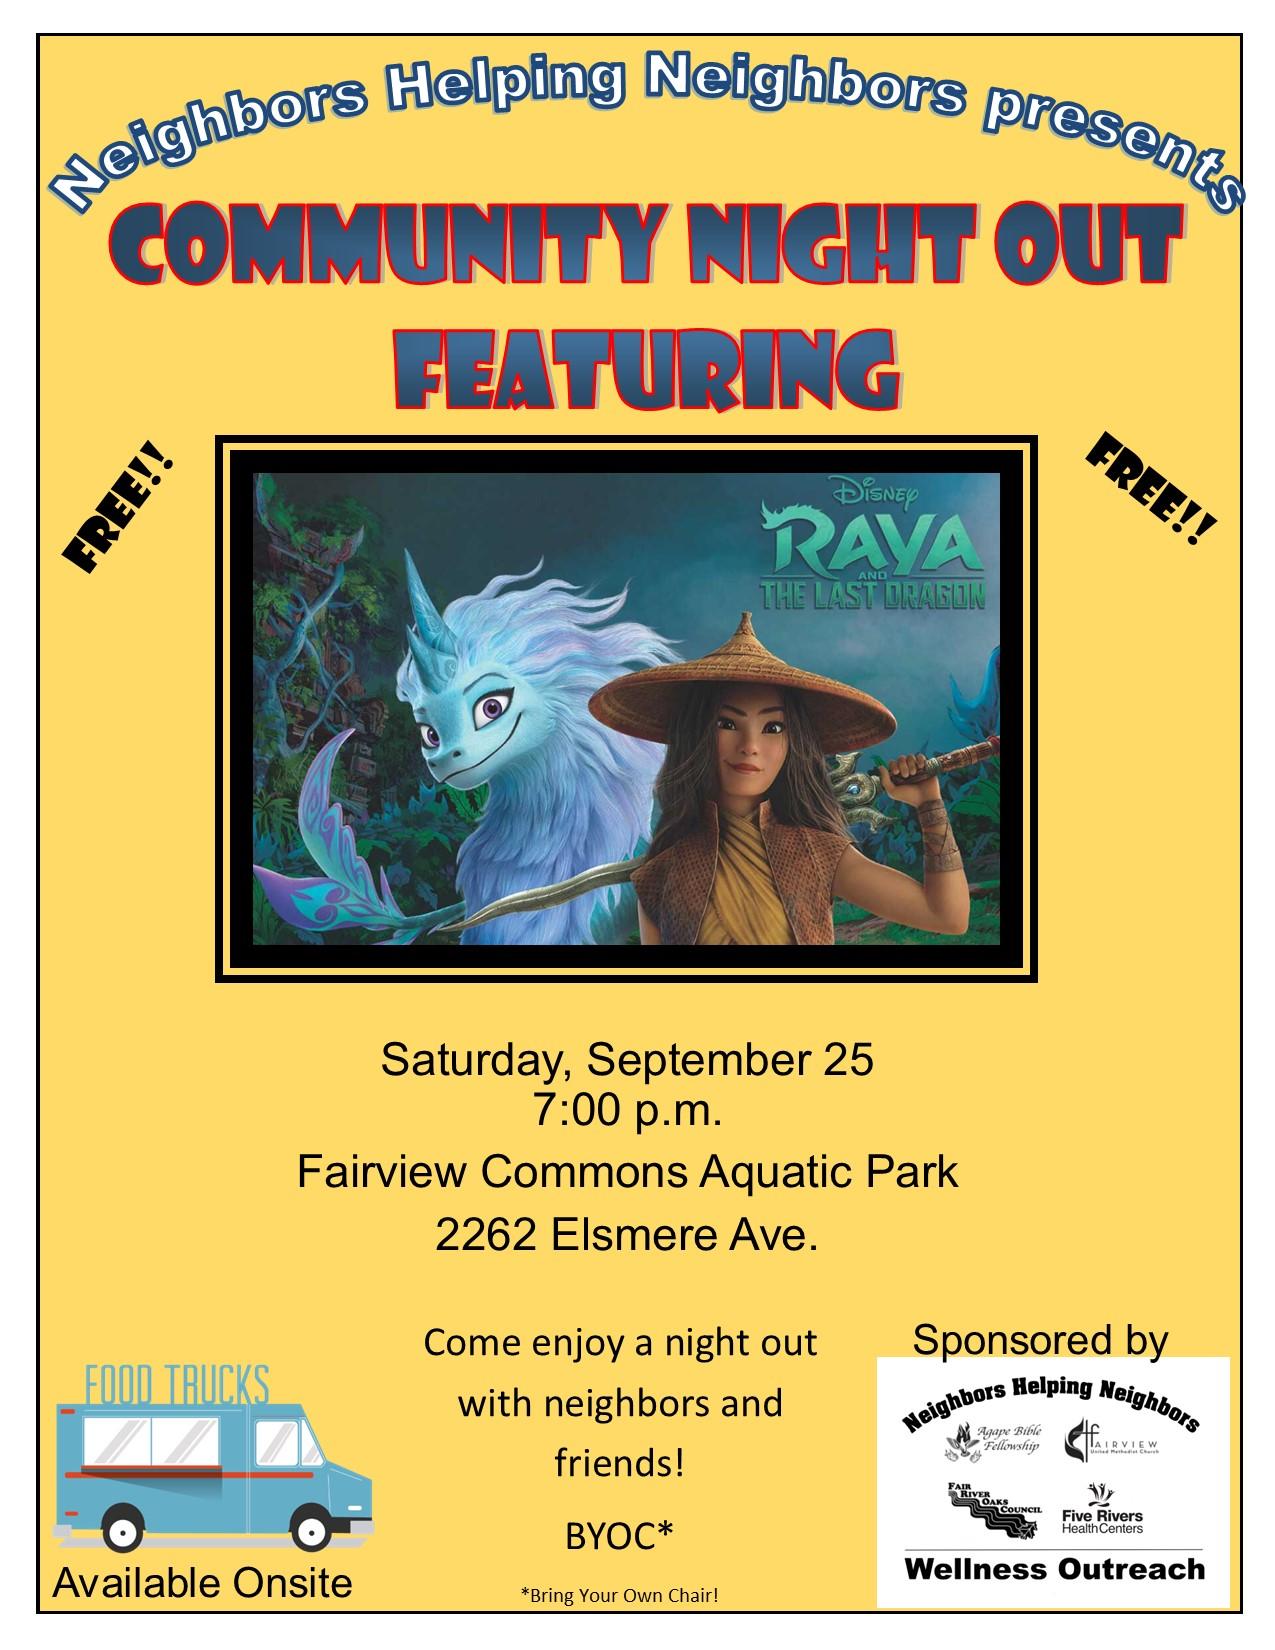 Neighbors Helping Neighbors Community Night Out